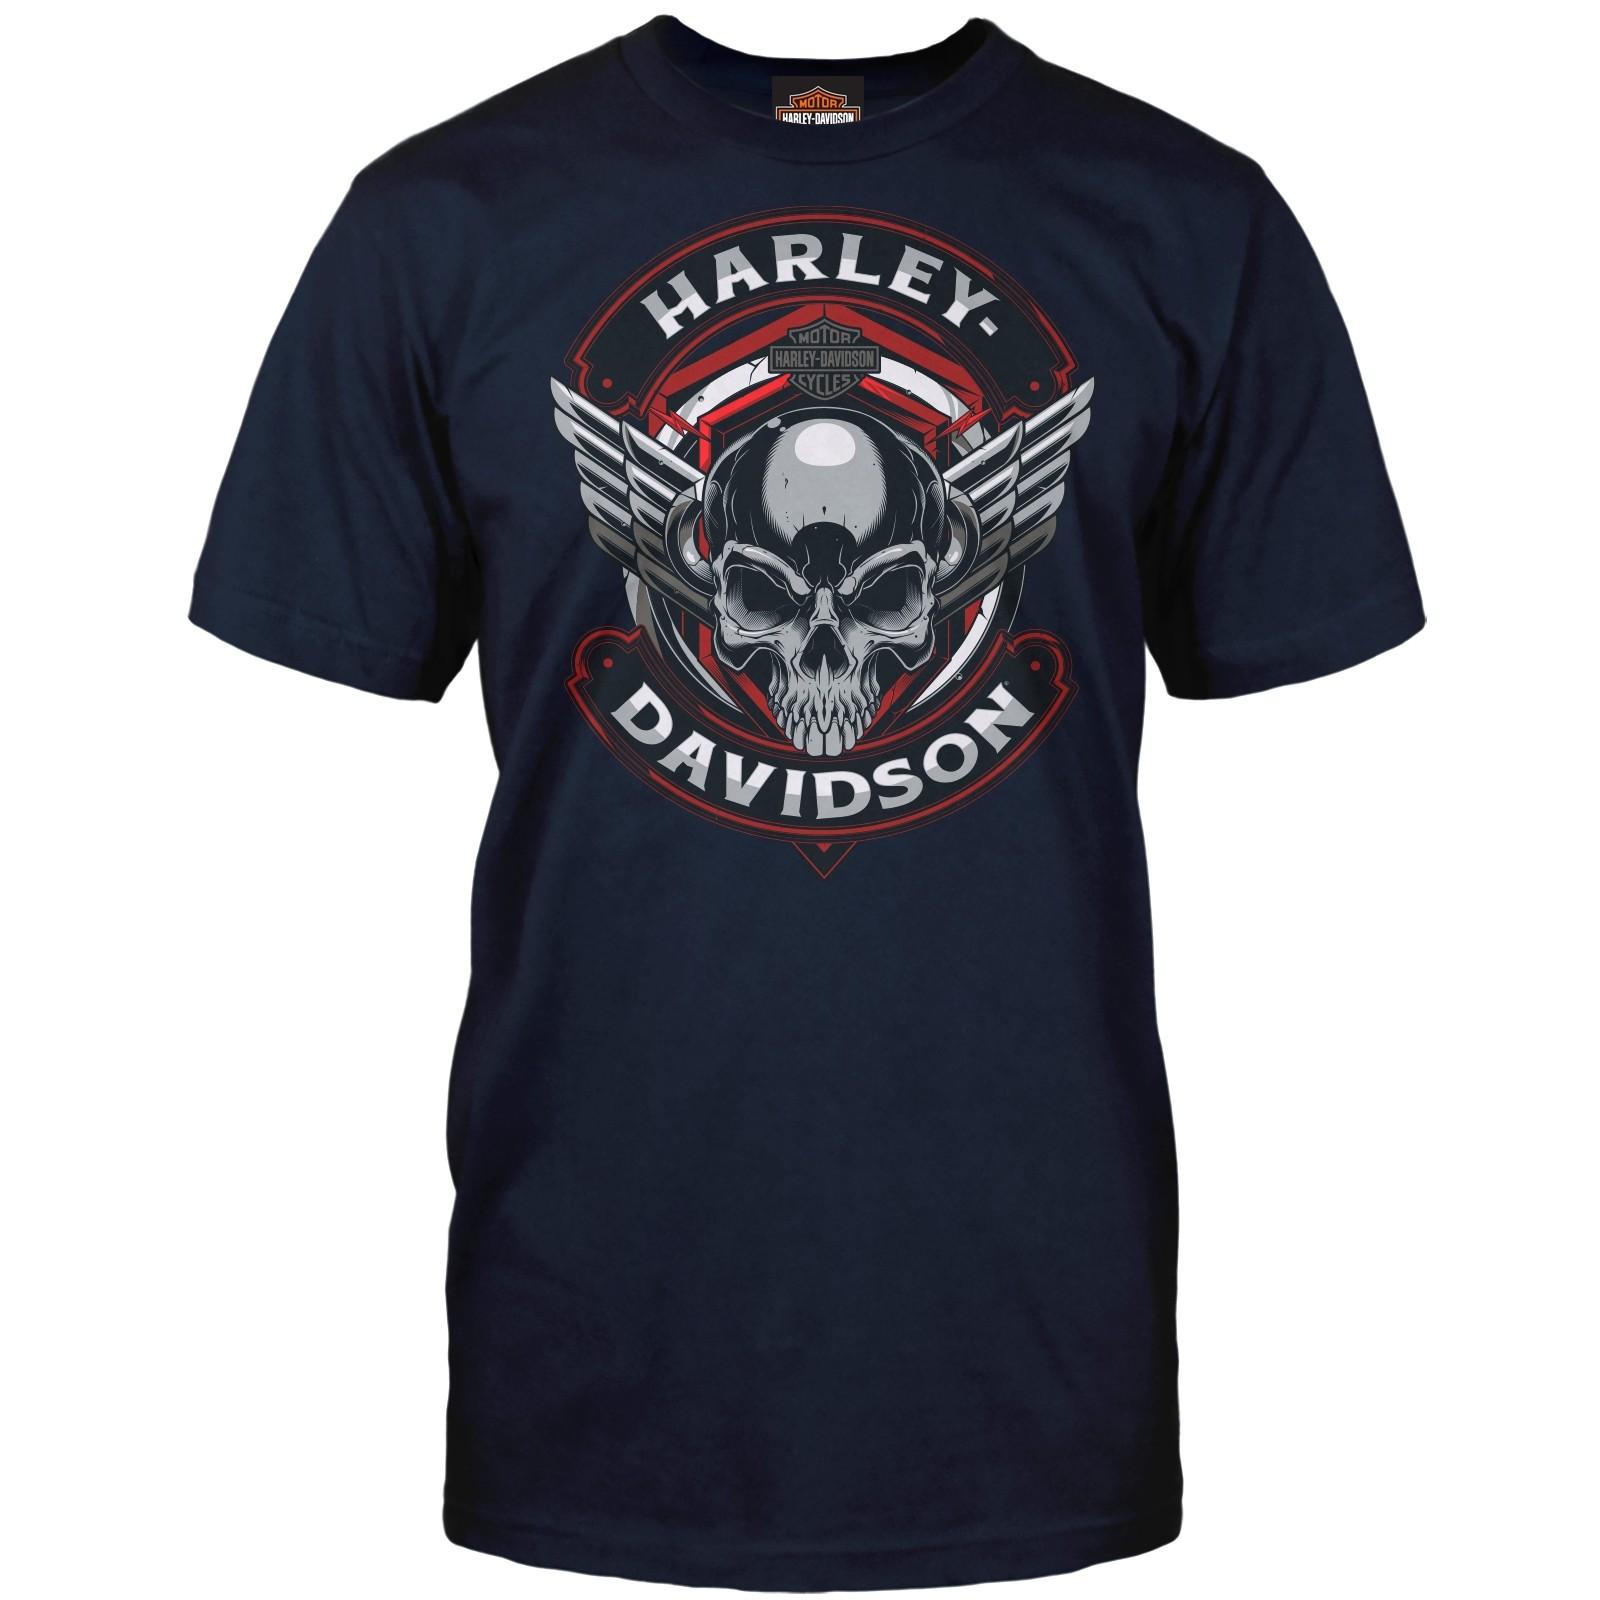 f1dac883e Harley-Davidson Men's Graphic Tee - Camp Humphreys   Steel Winged ...